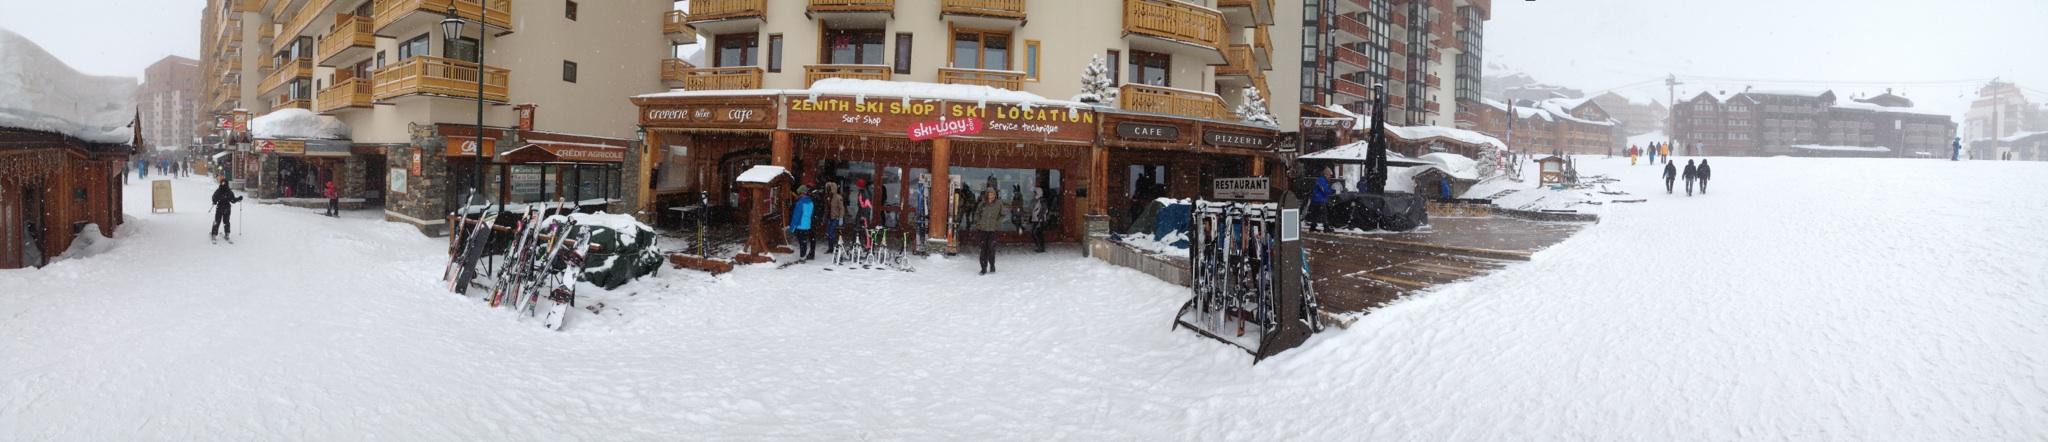 location de ski val thorens